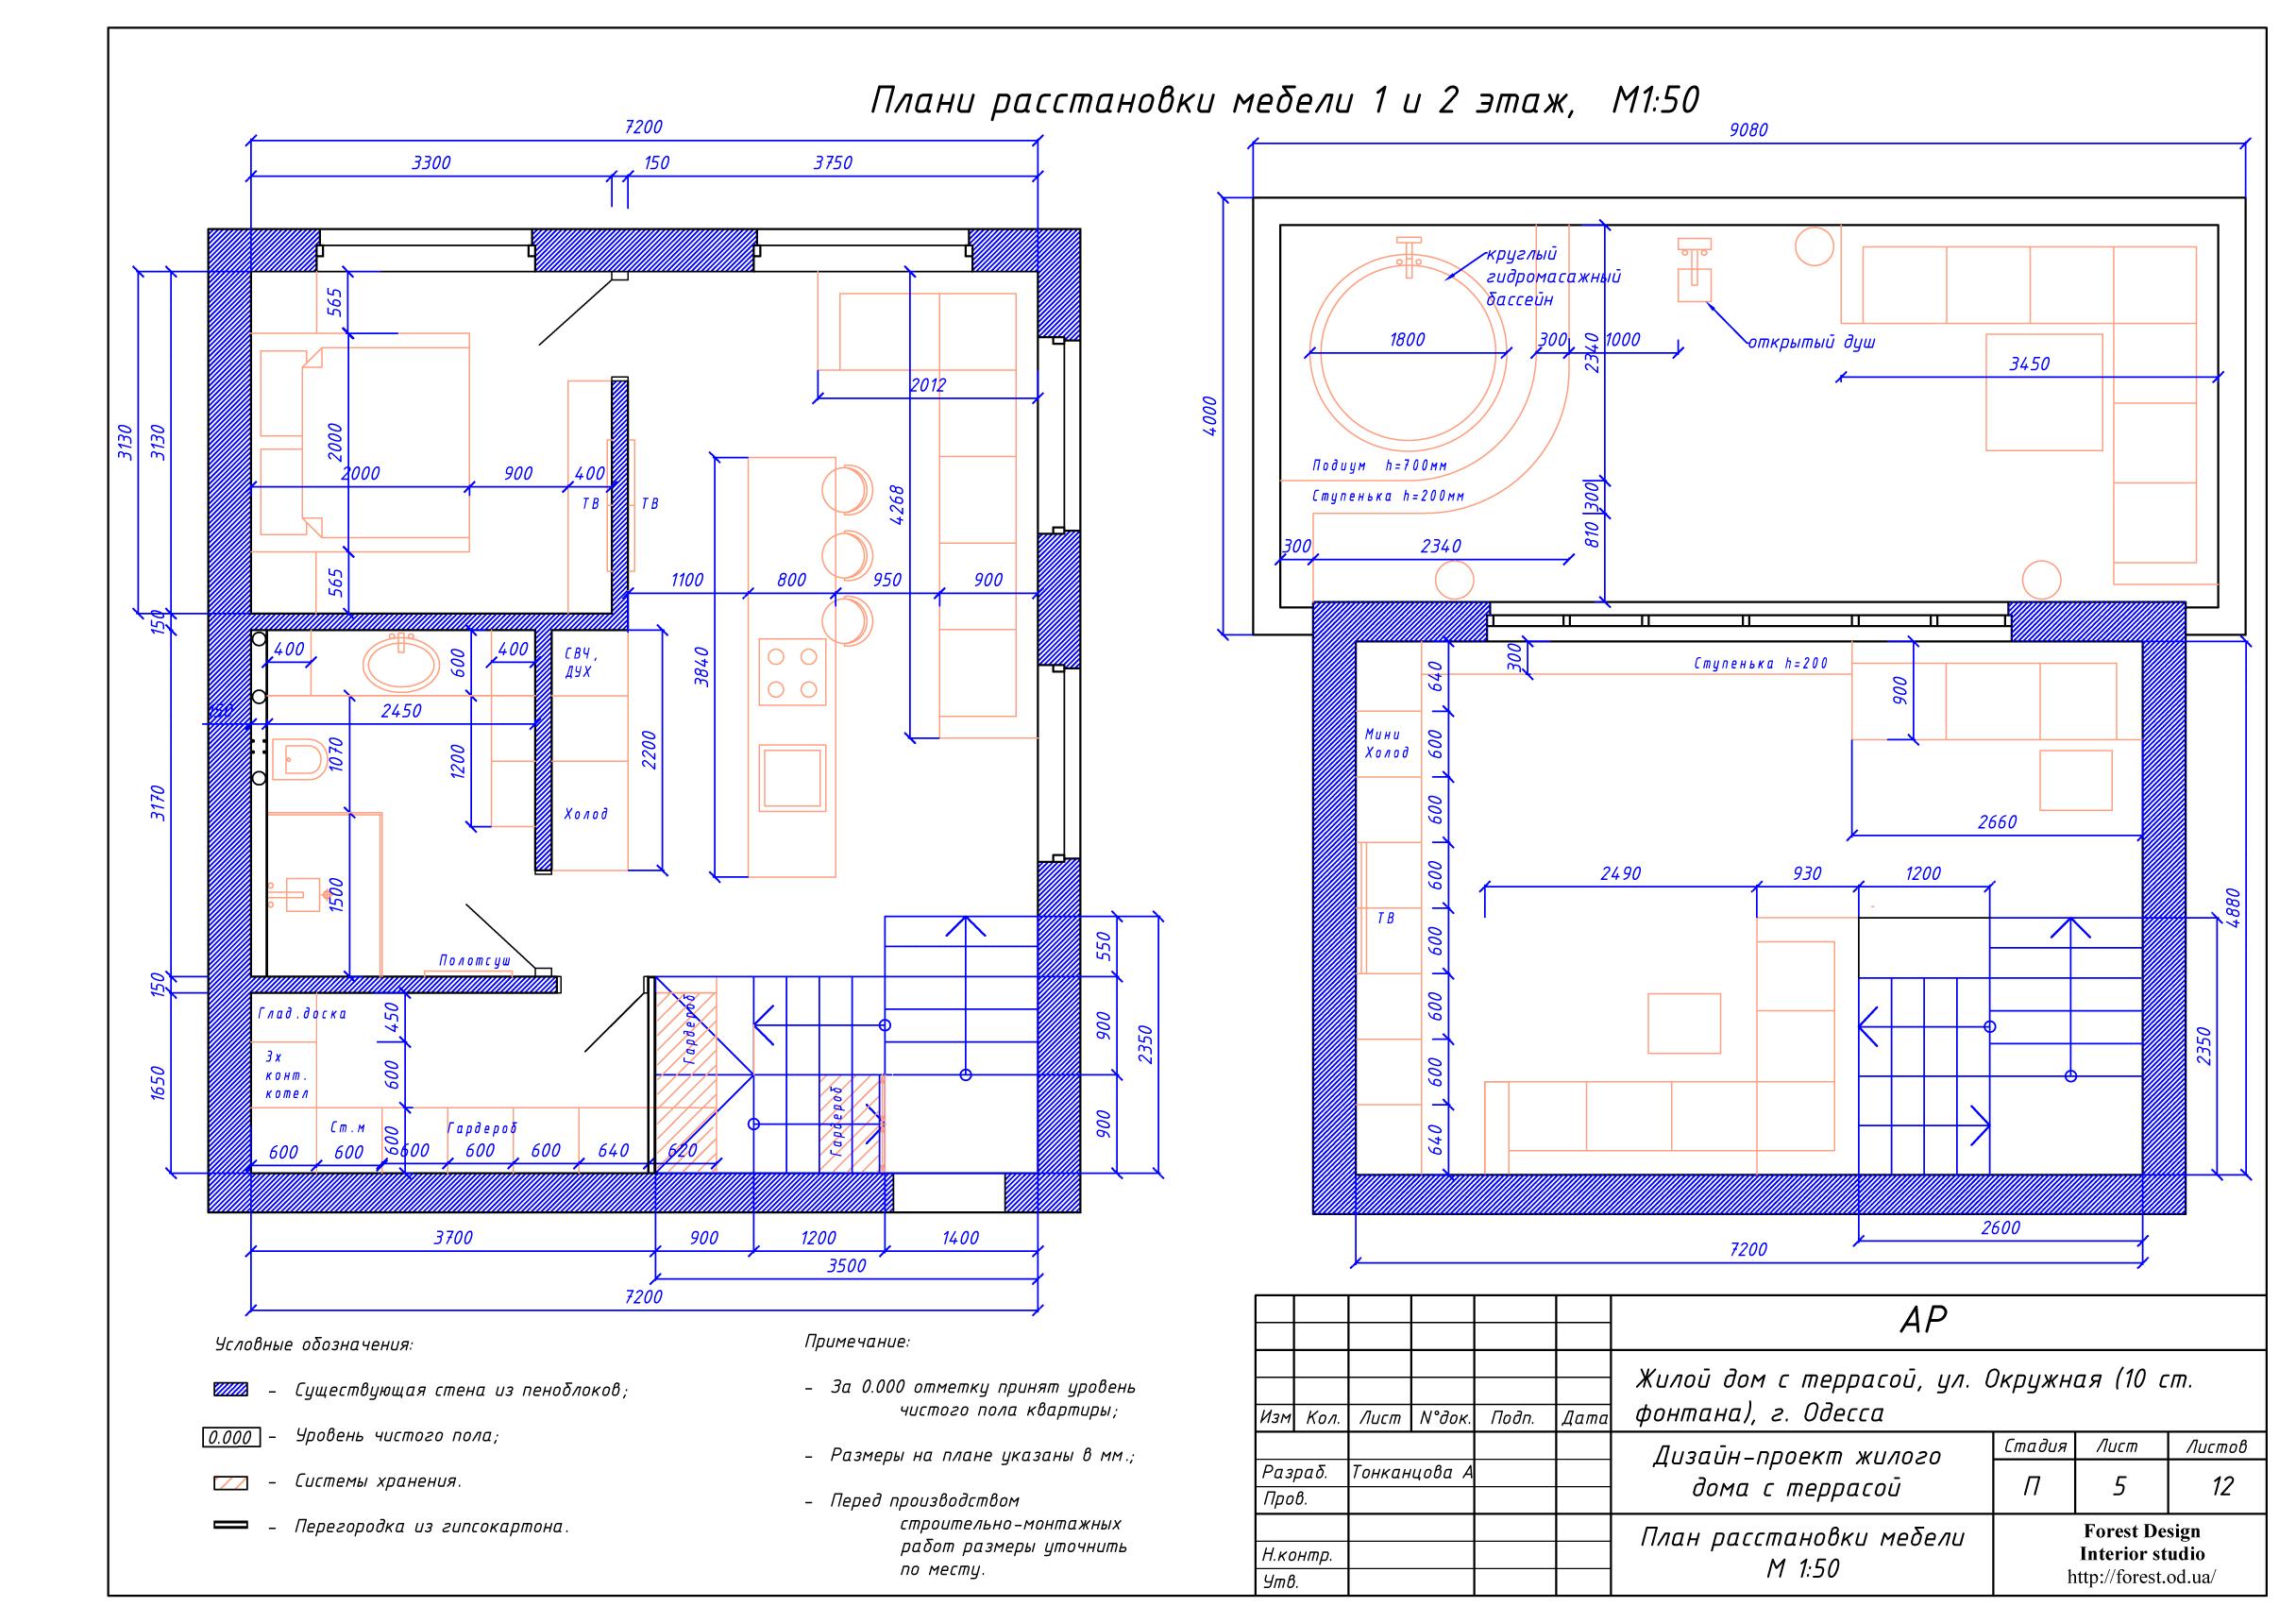 6-план расстановки мебели